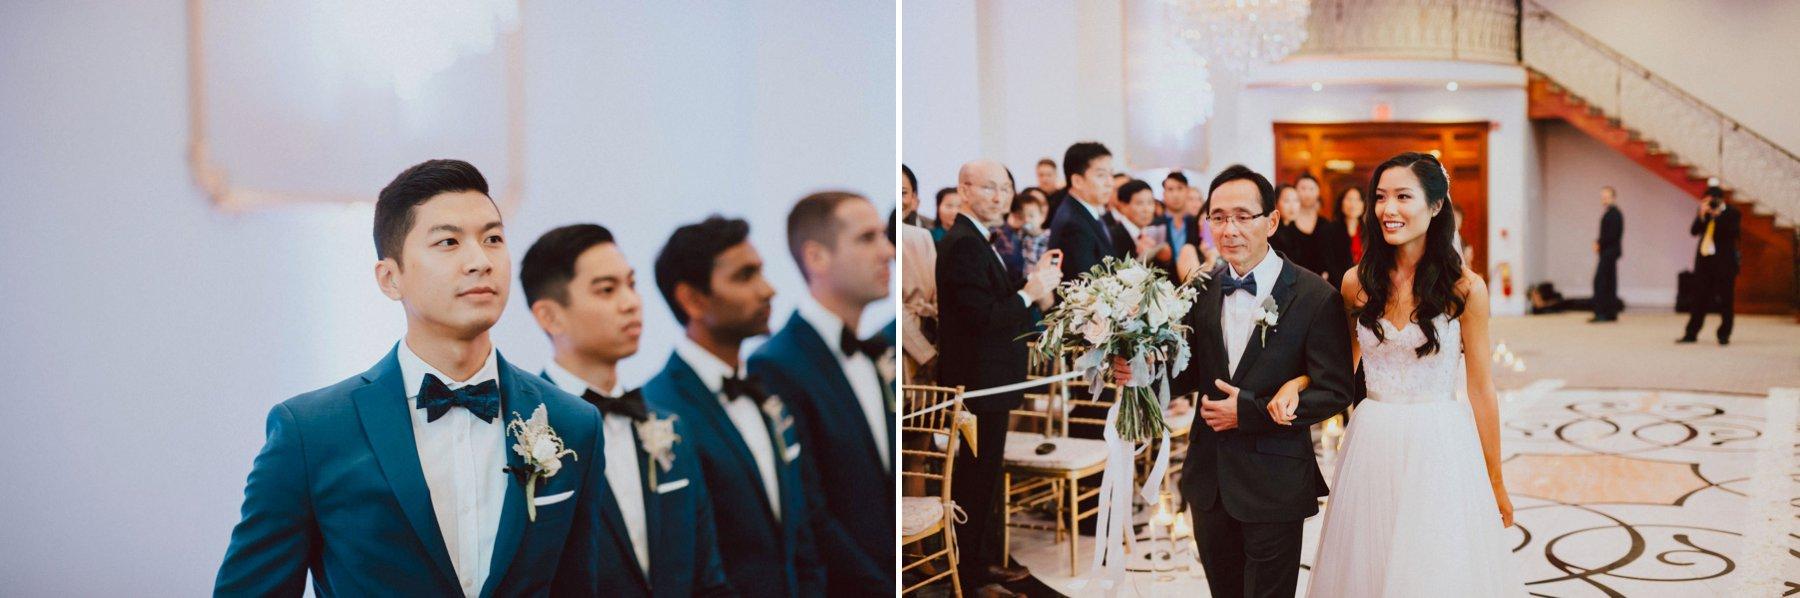 philadelphia-wedding-photographer-107.jpg